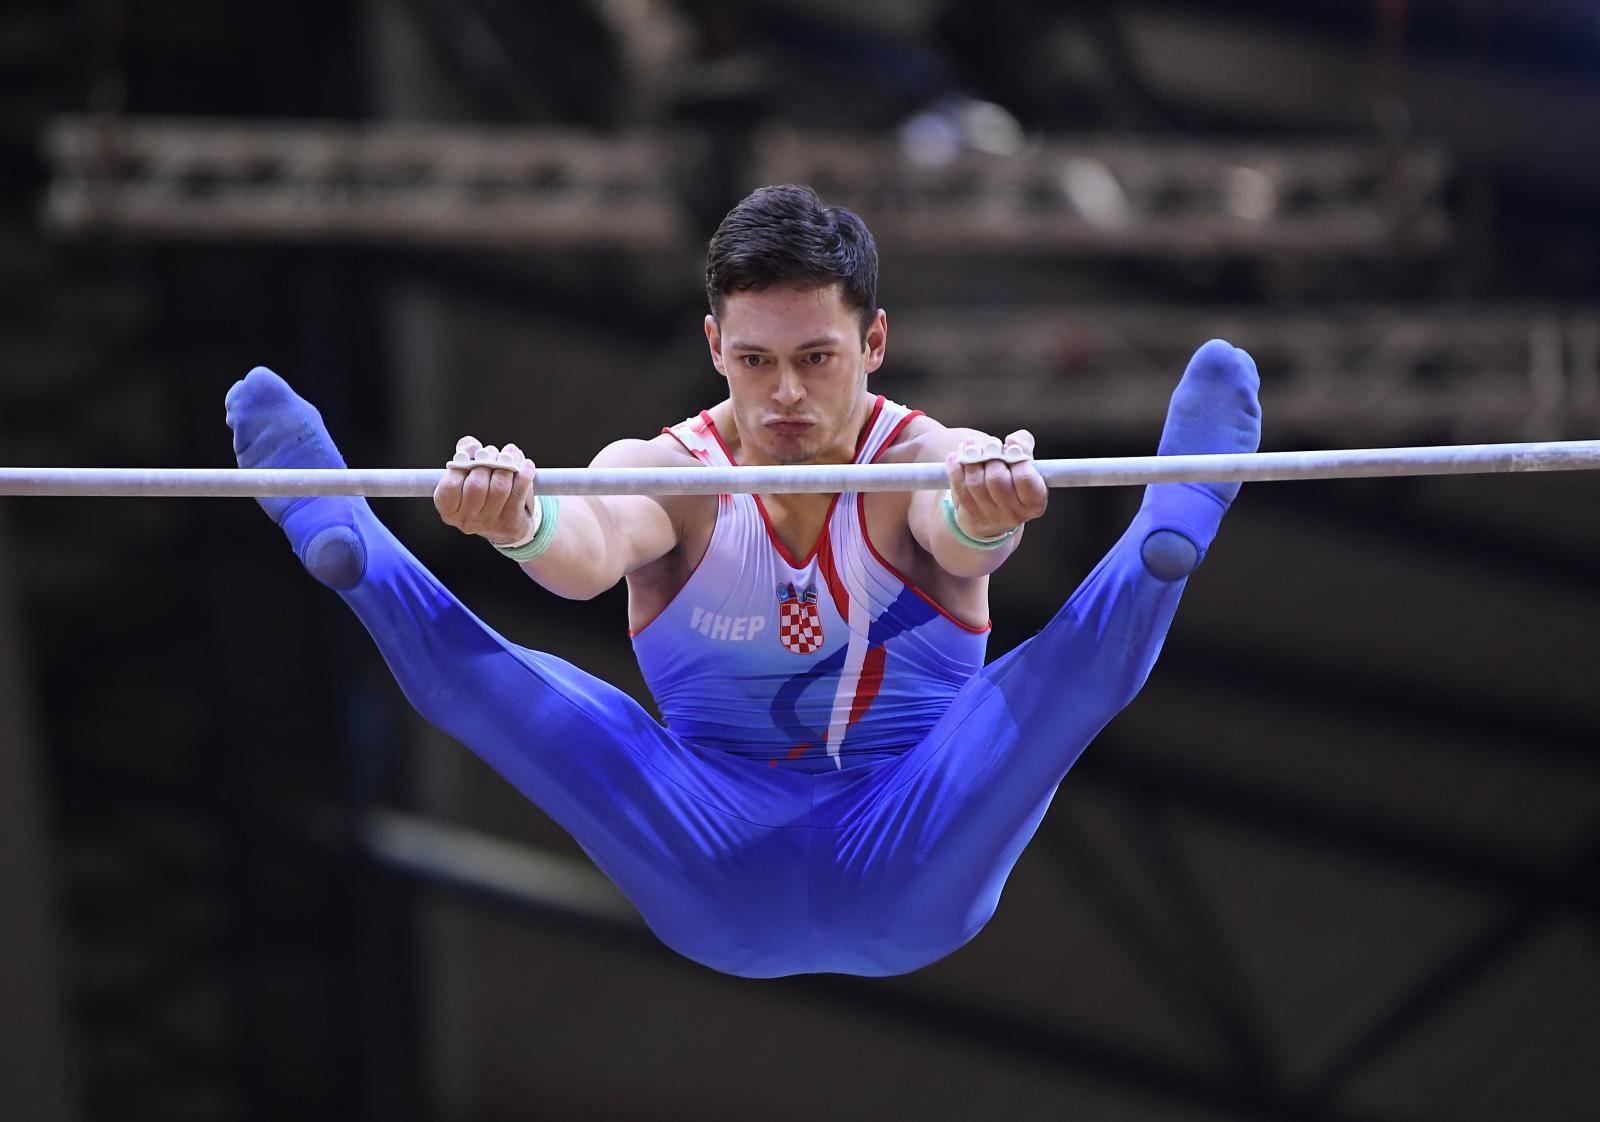 GES / Gymnastics / Gymnastics World Championship Doha, 25.10.2018